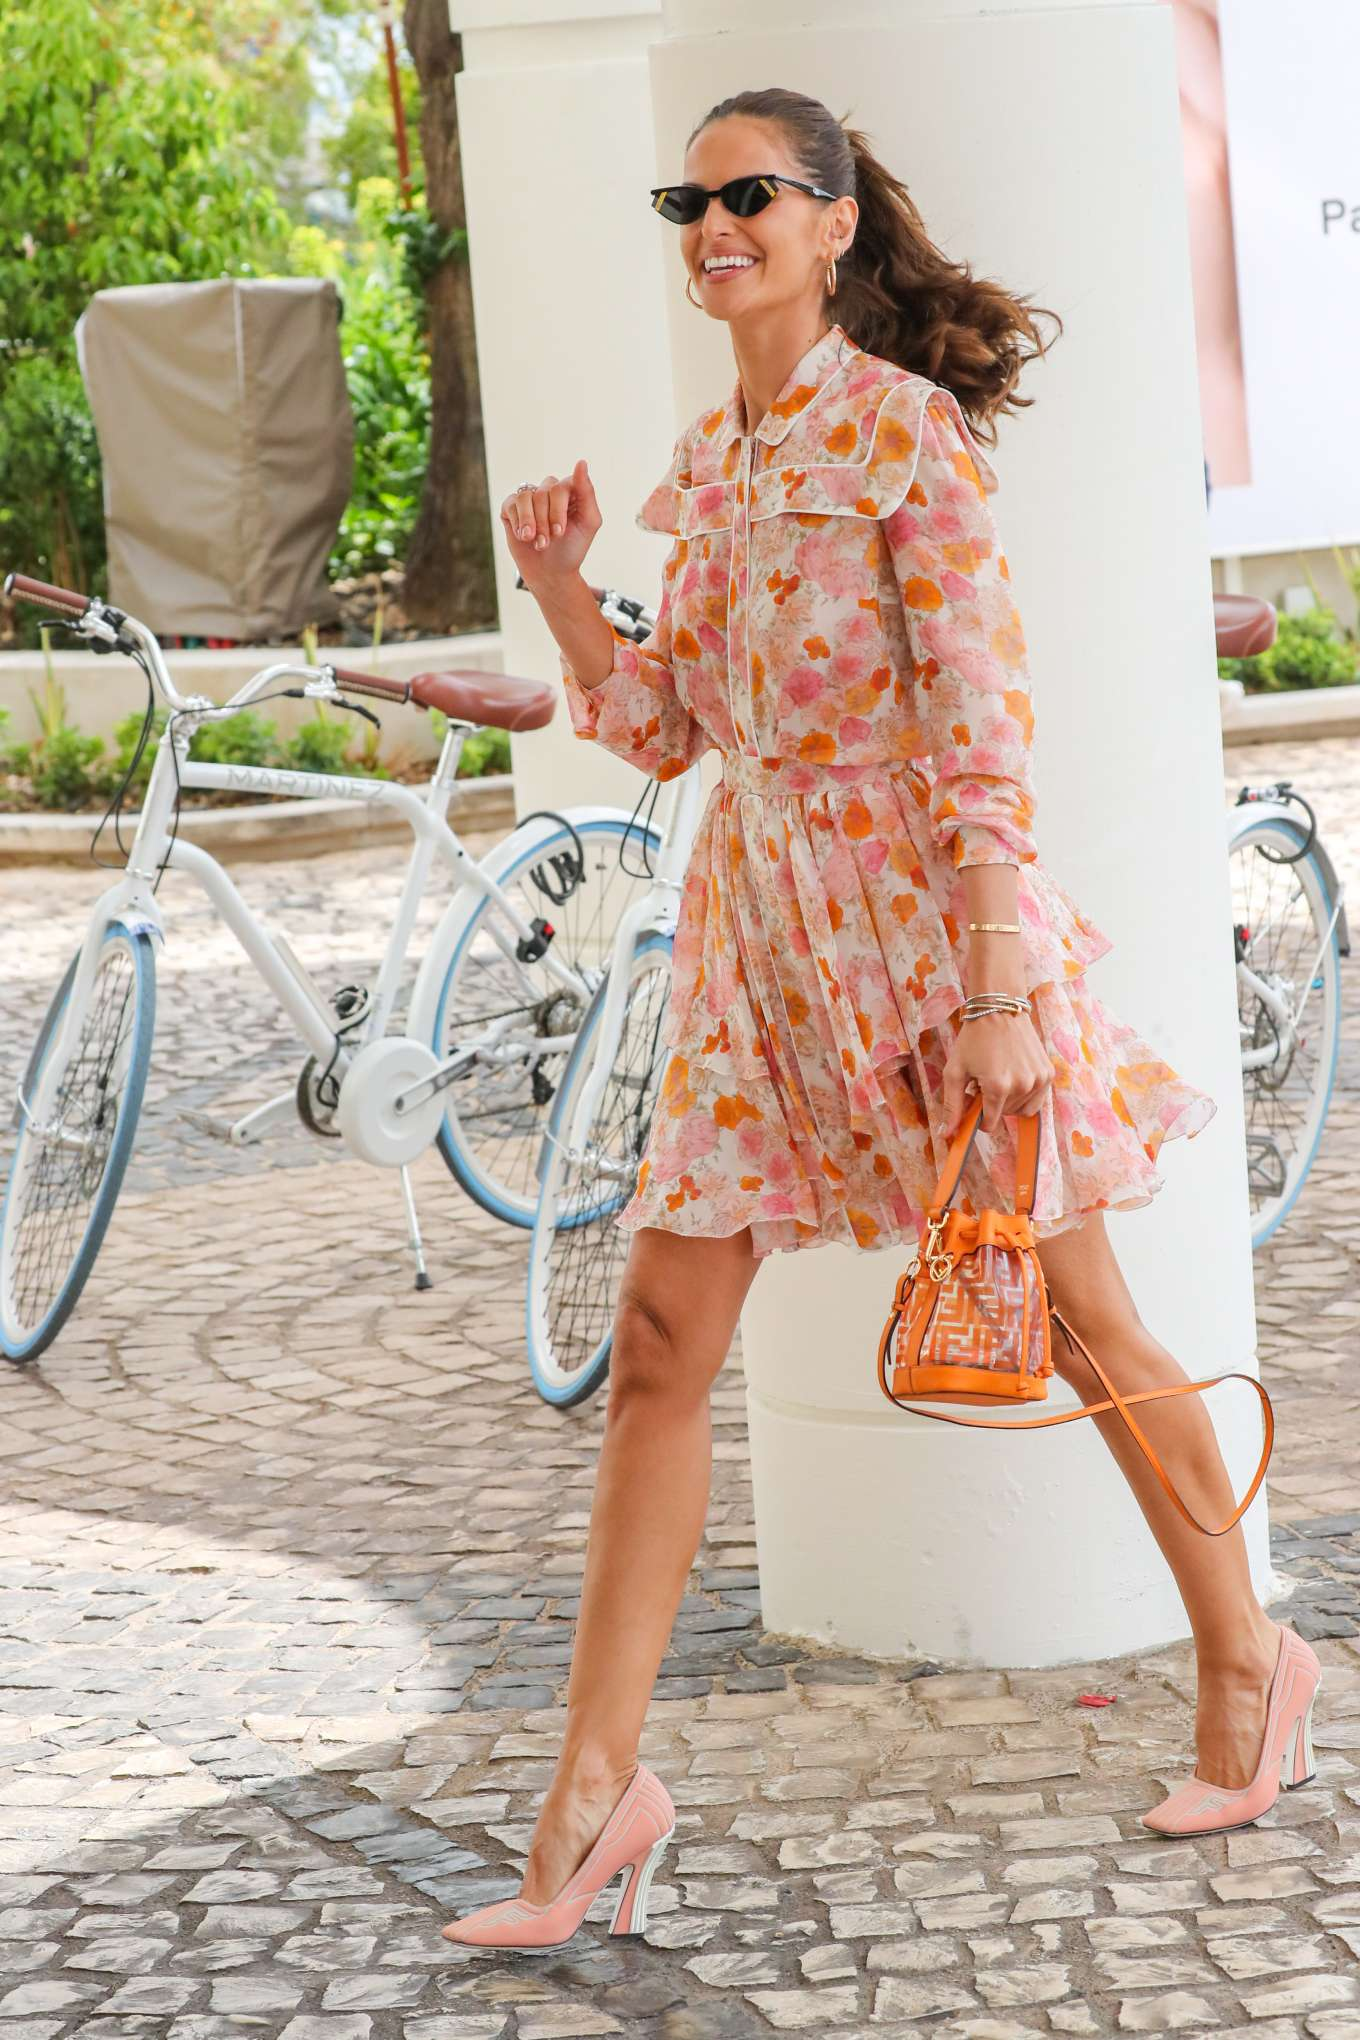 Izabel Goulart 2019 : Izabel Goulart in Floral Print Dress at the Martinez Hotel-18